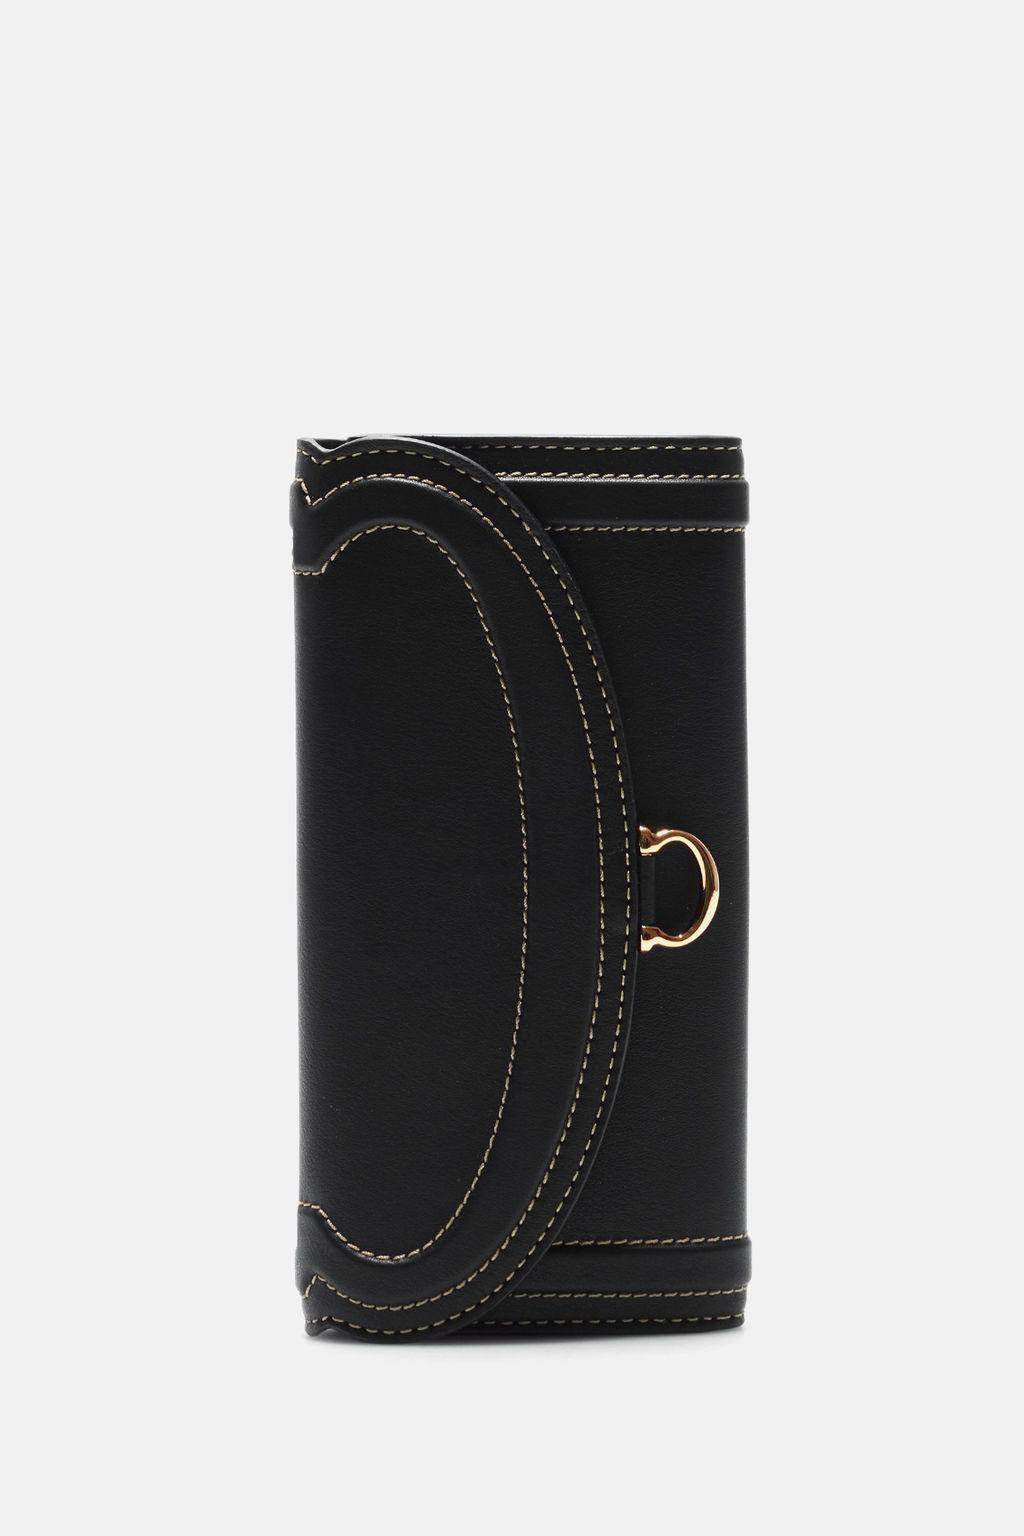 Charro Insignia | American wallet